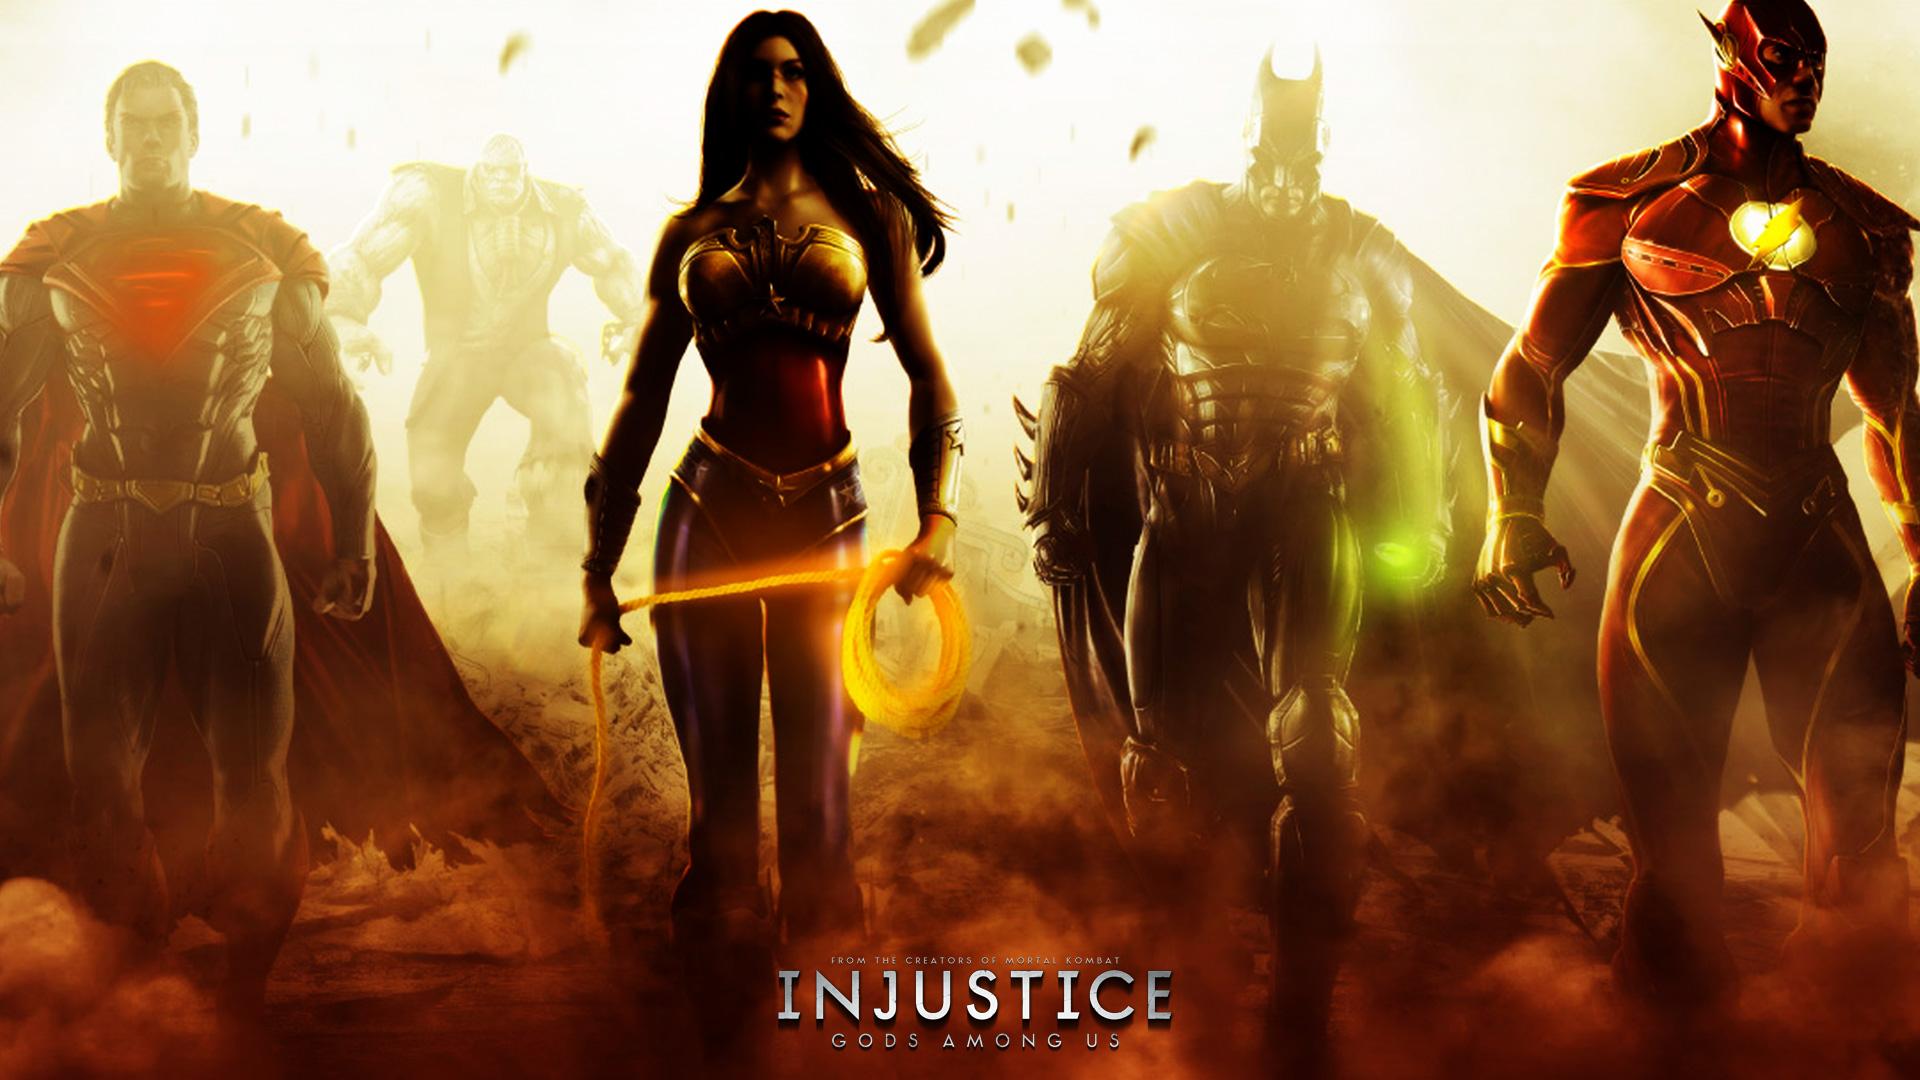 Injustice Gods Among Us wallpaper 7